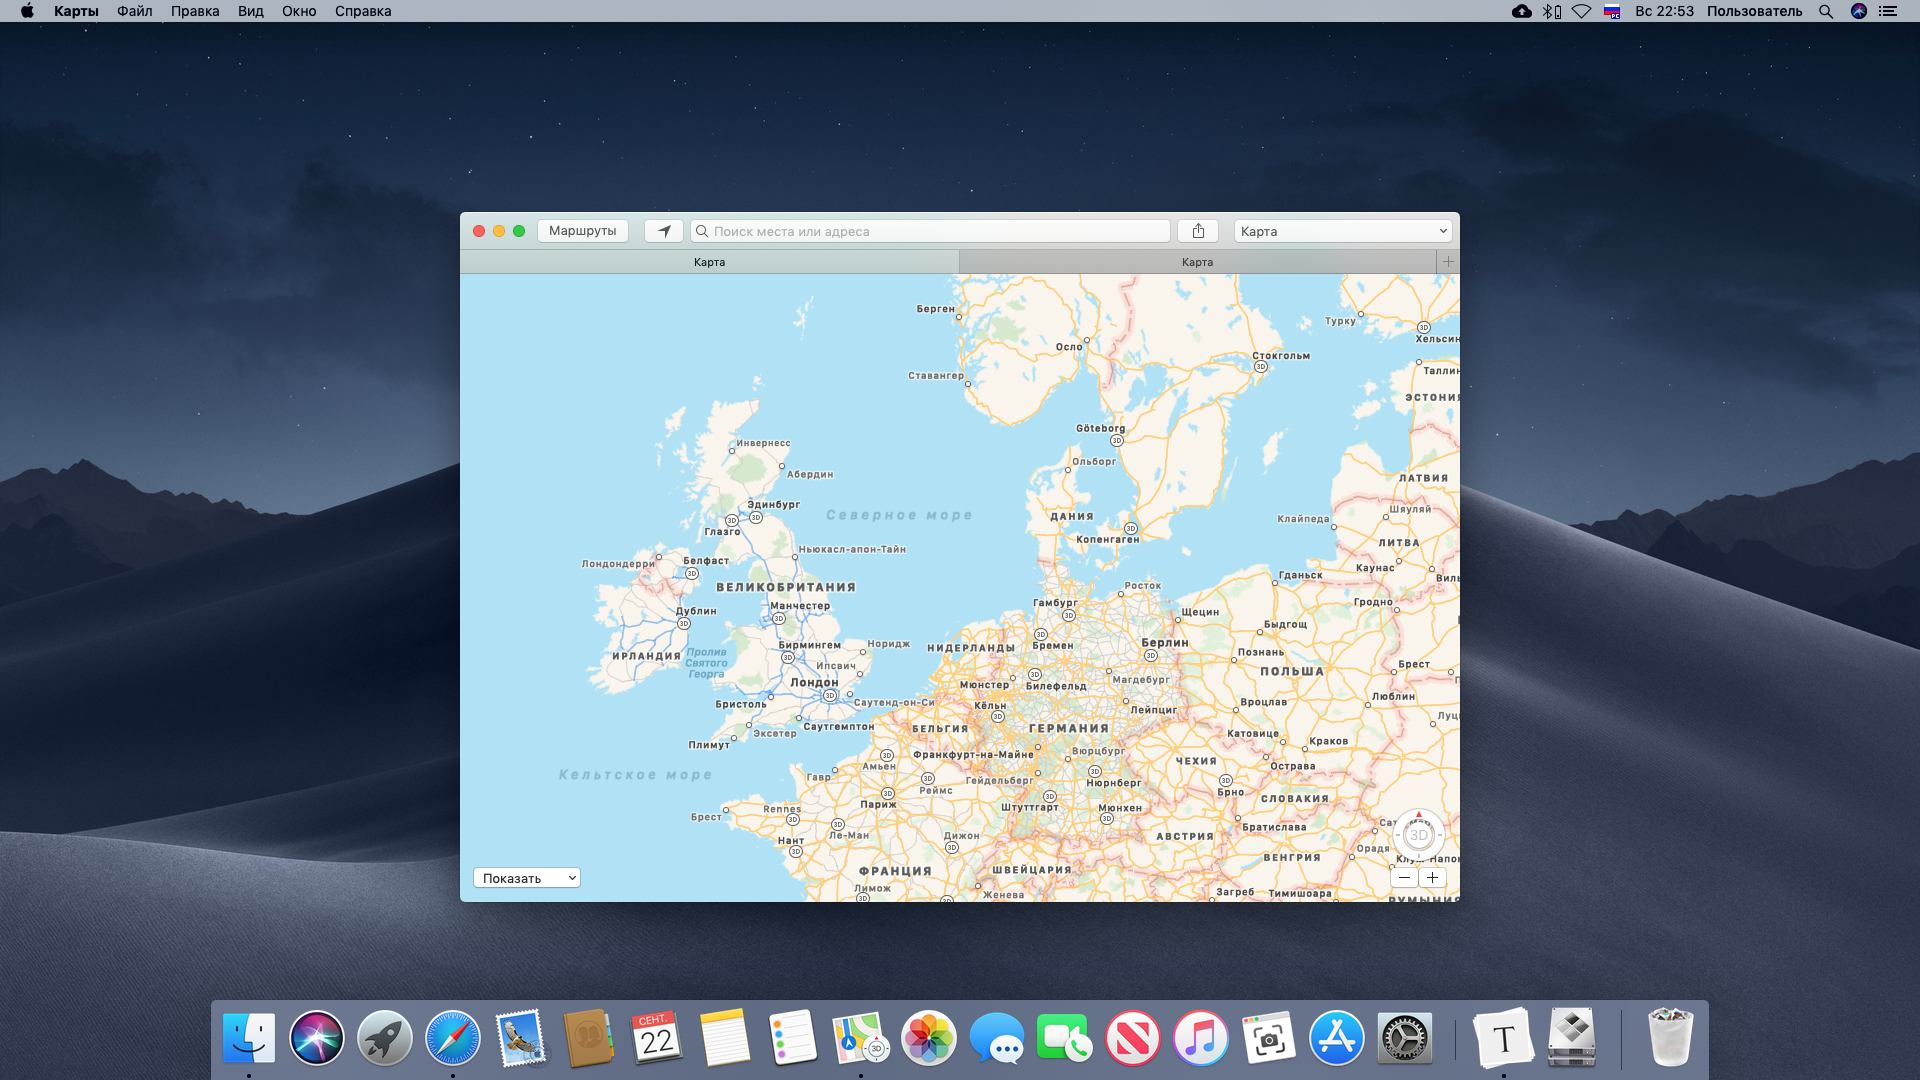 Настройка Mac: работа с вкладками в приложениях